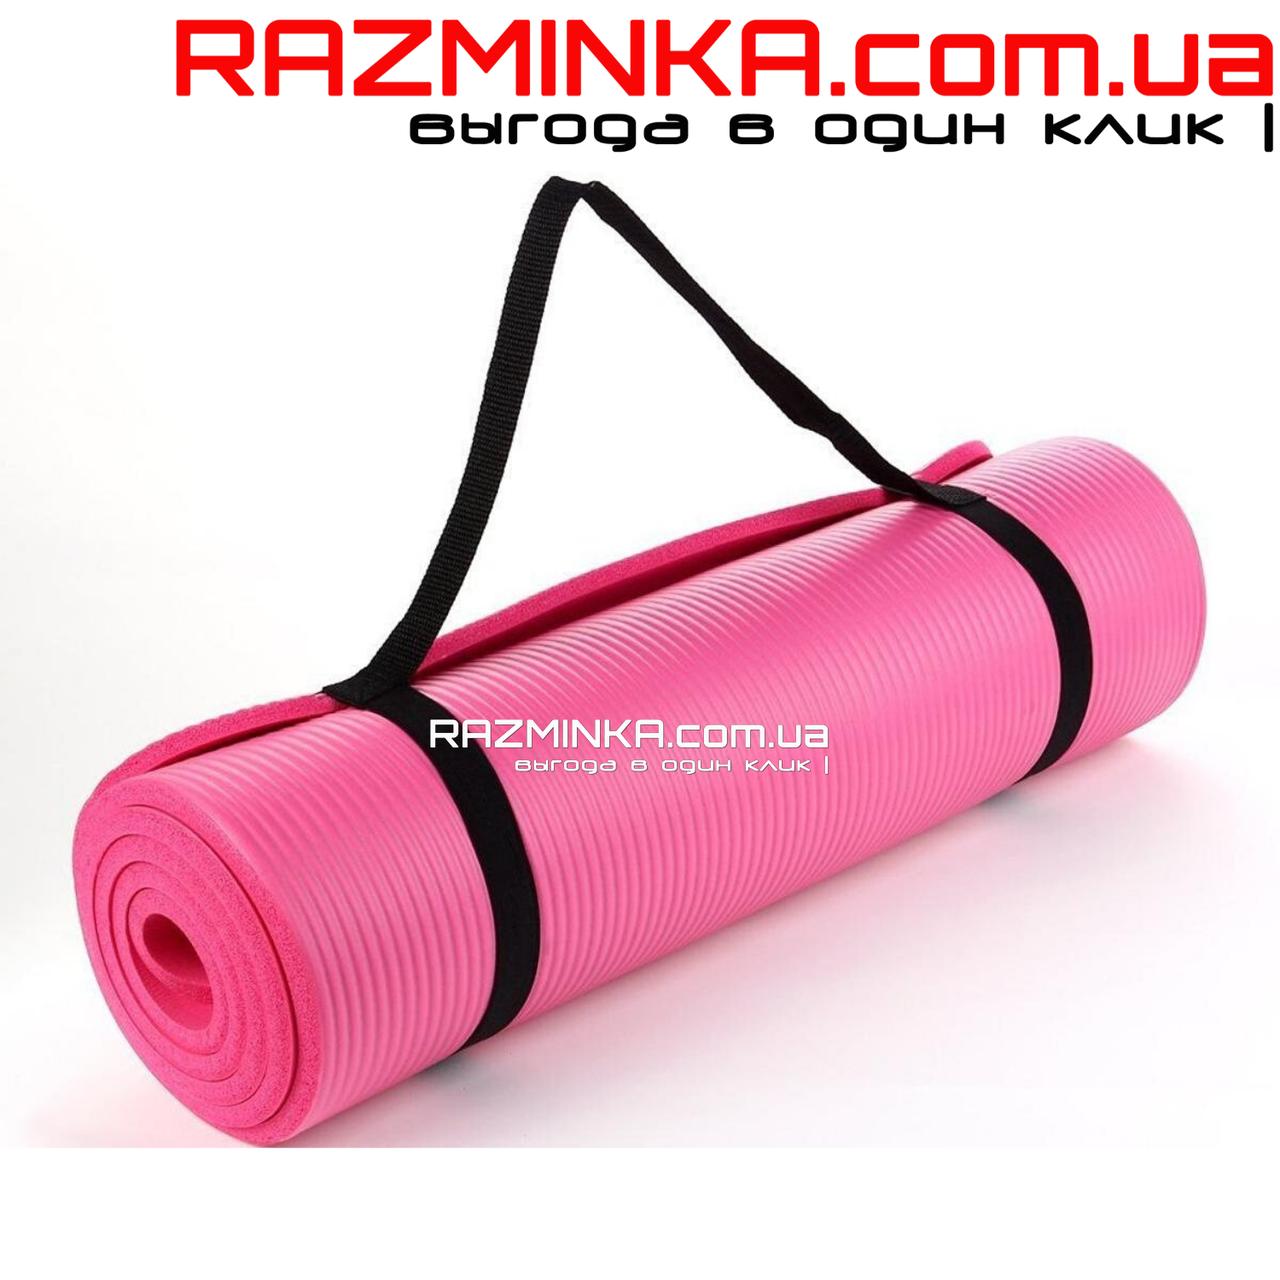 Каучуковый коврик для фитнеса NBR 1800х600х12мм, розовый